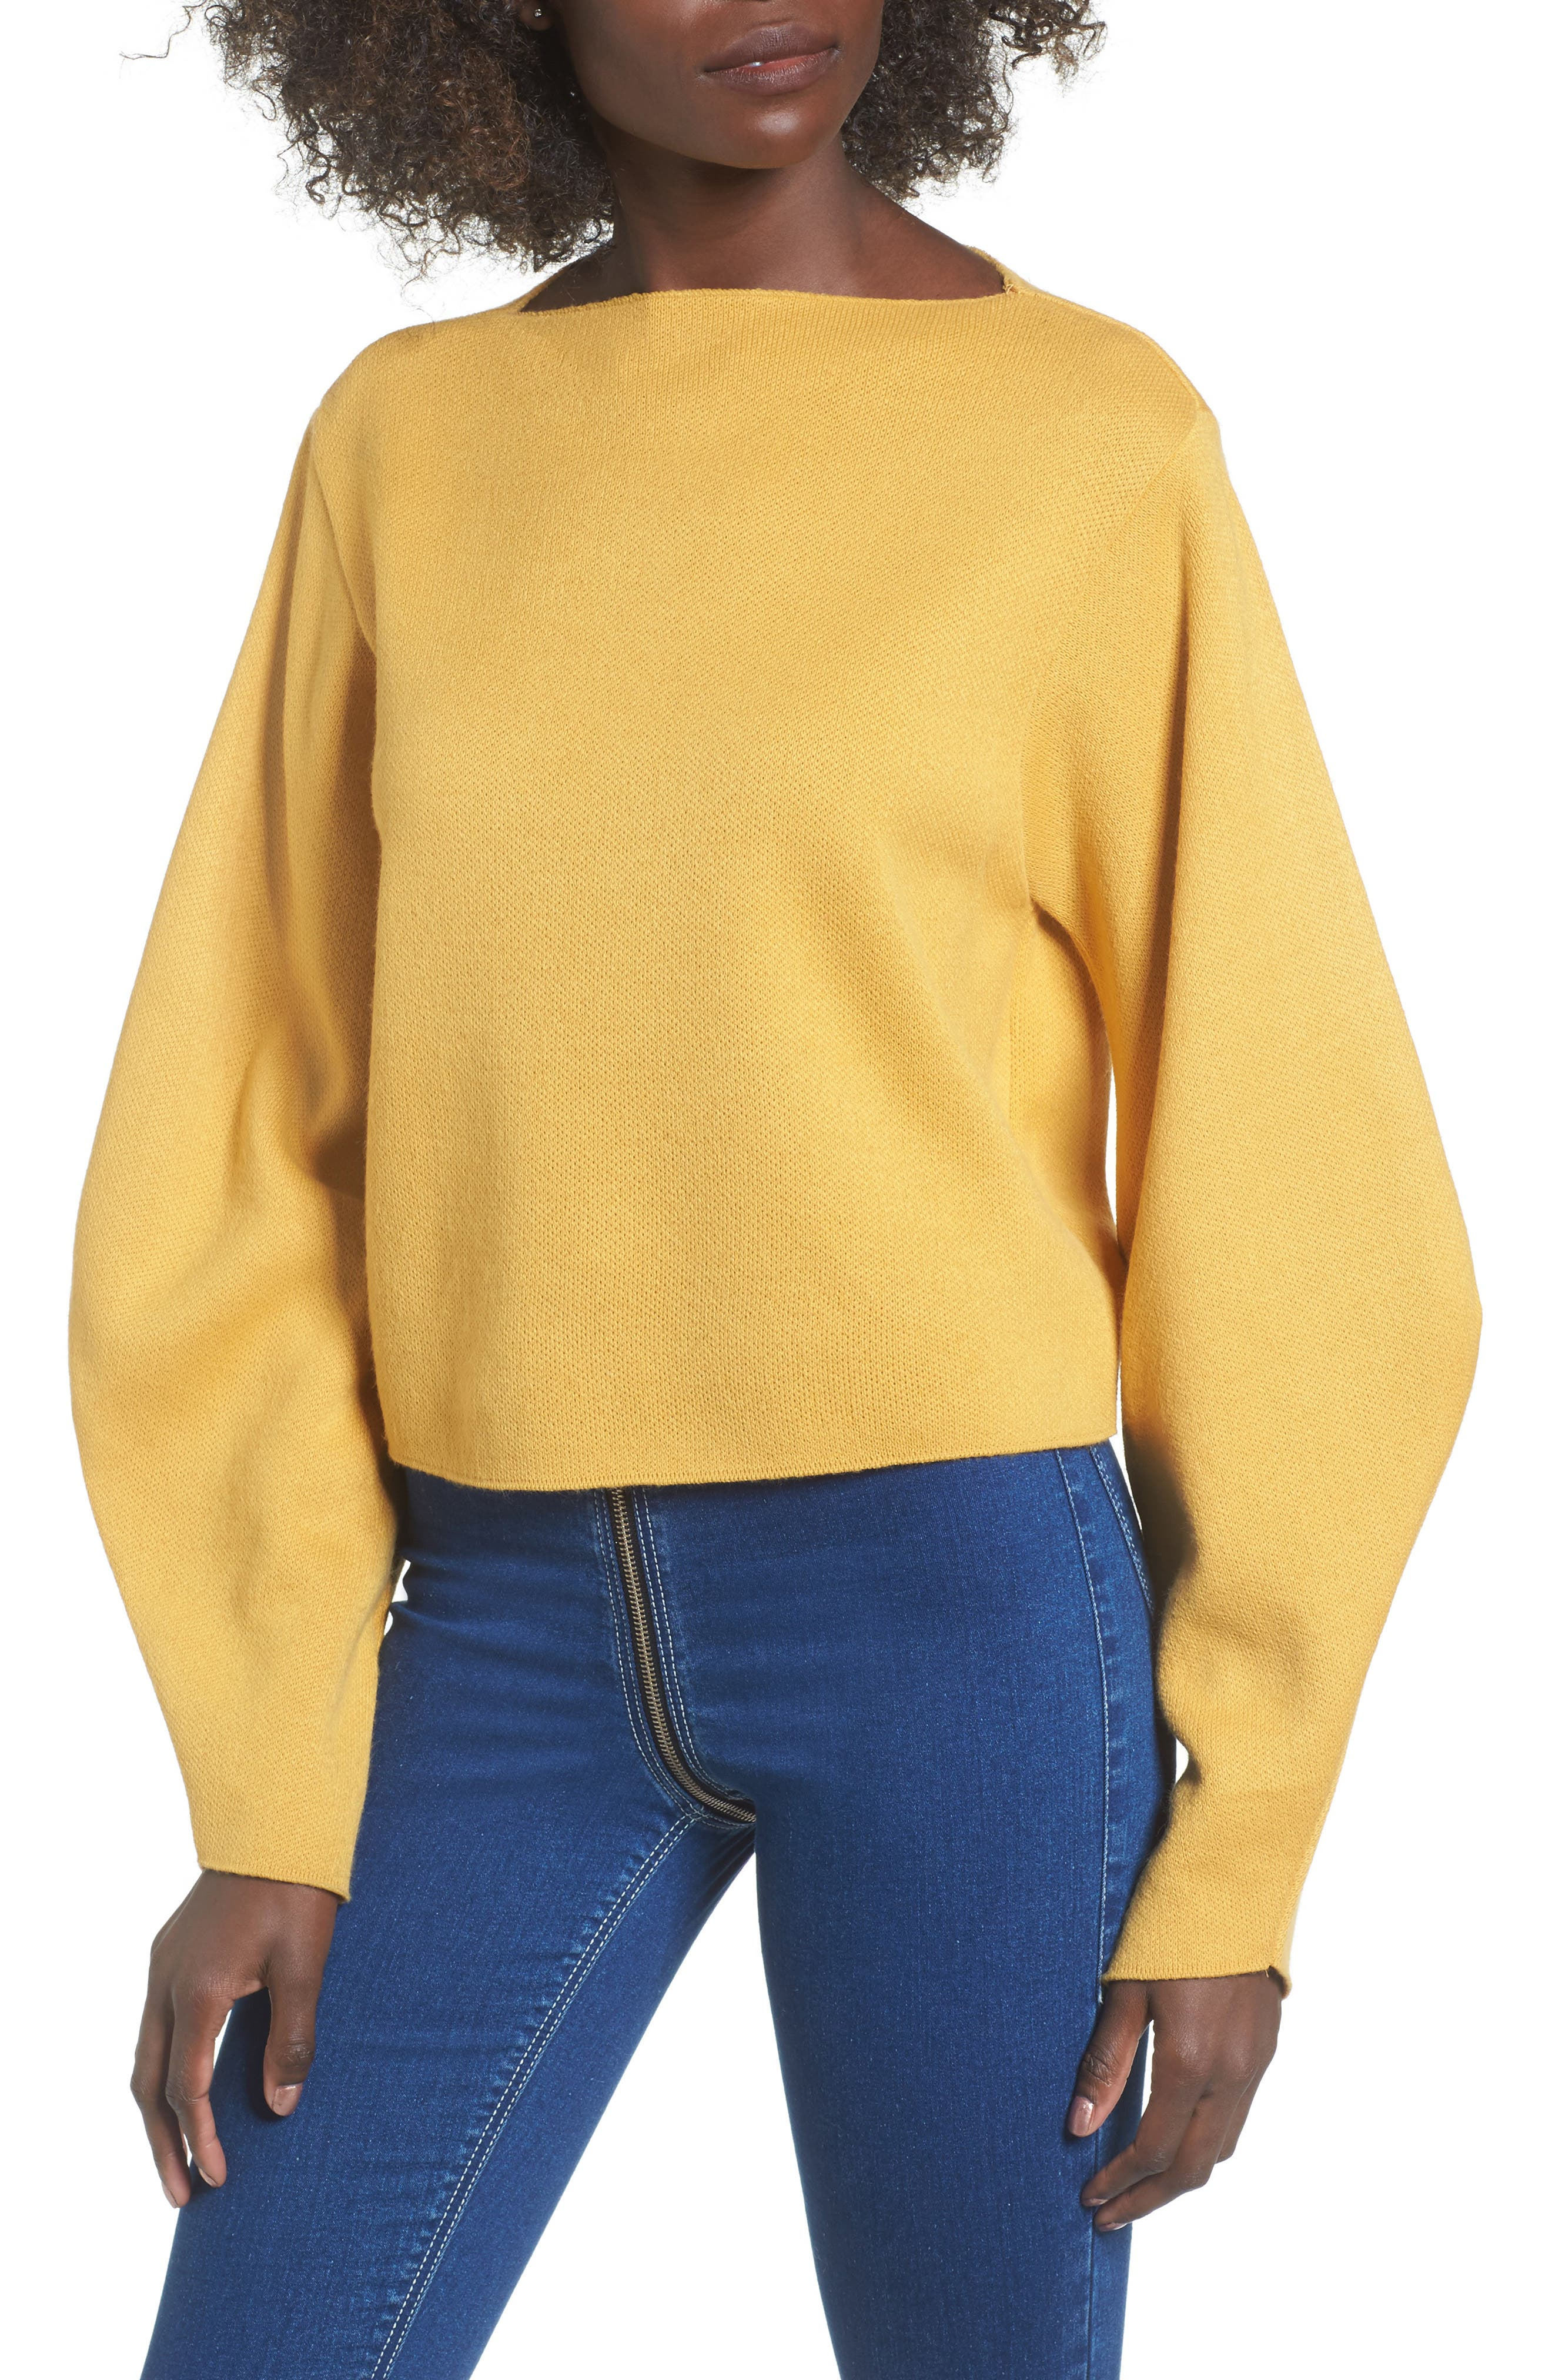 Balloon Sleeve Sweater,                             Main thumbnail 1, color,                             700